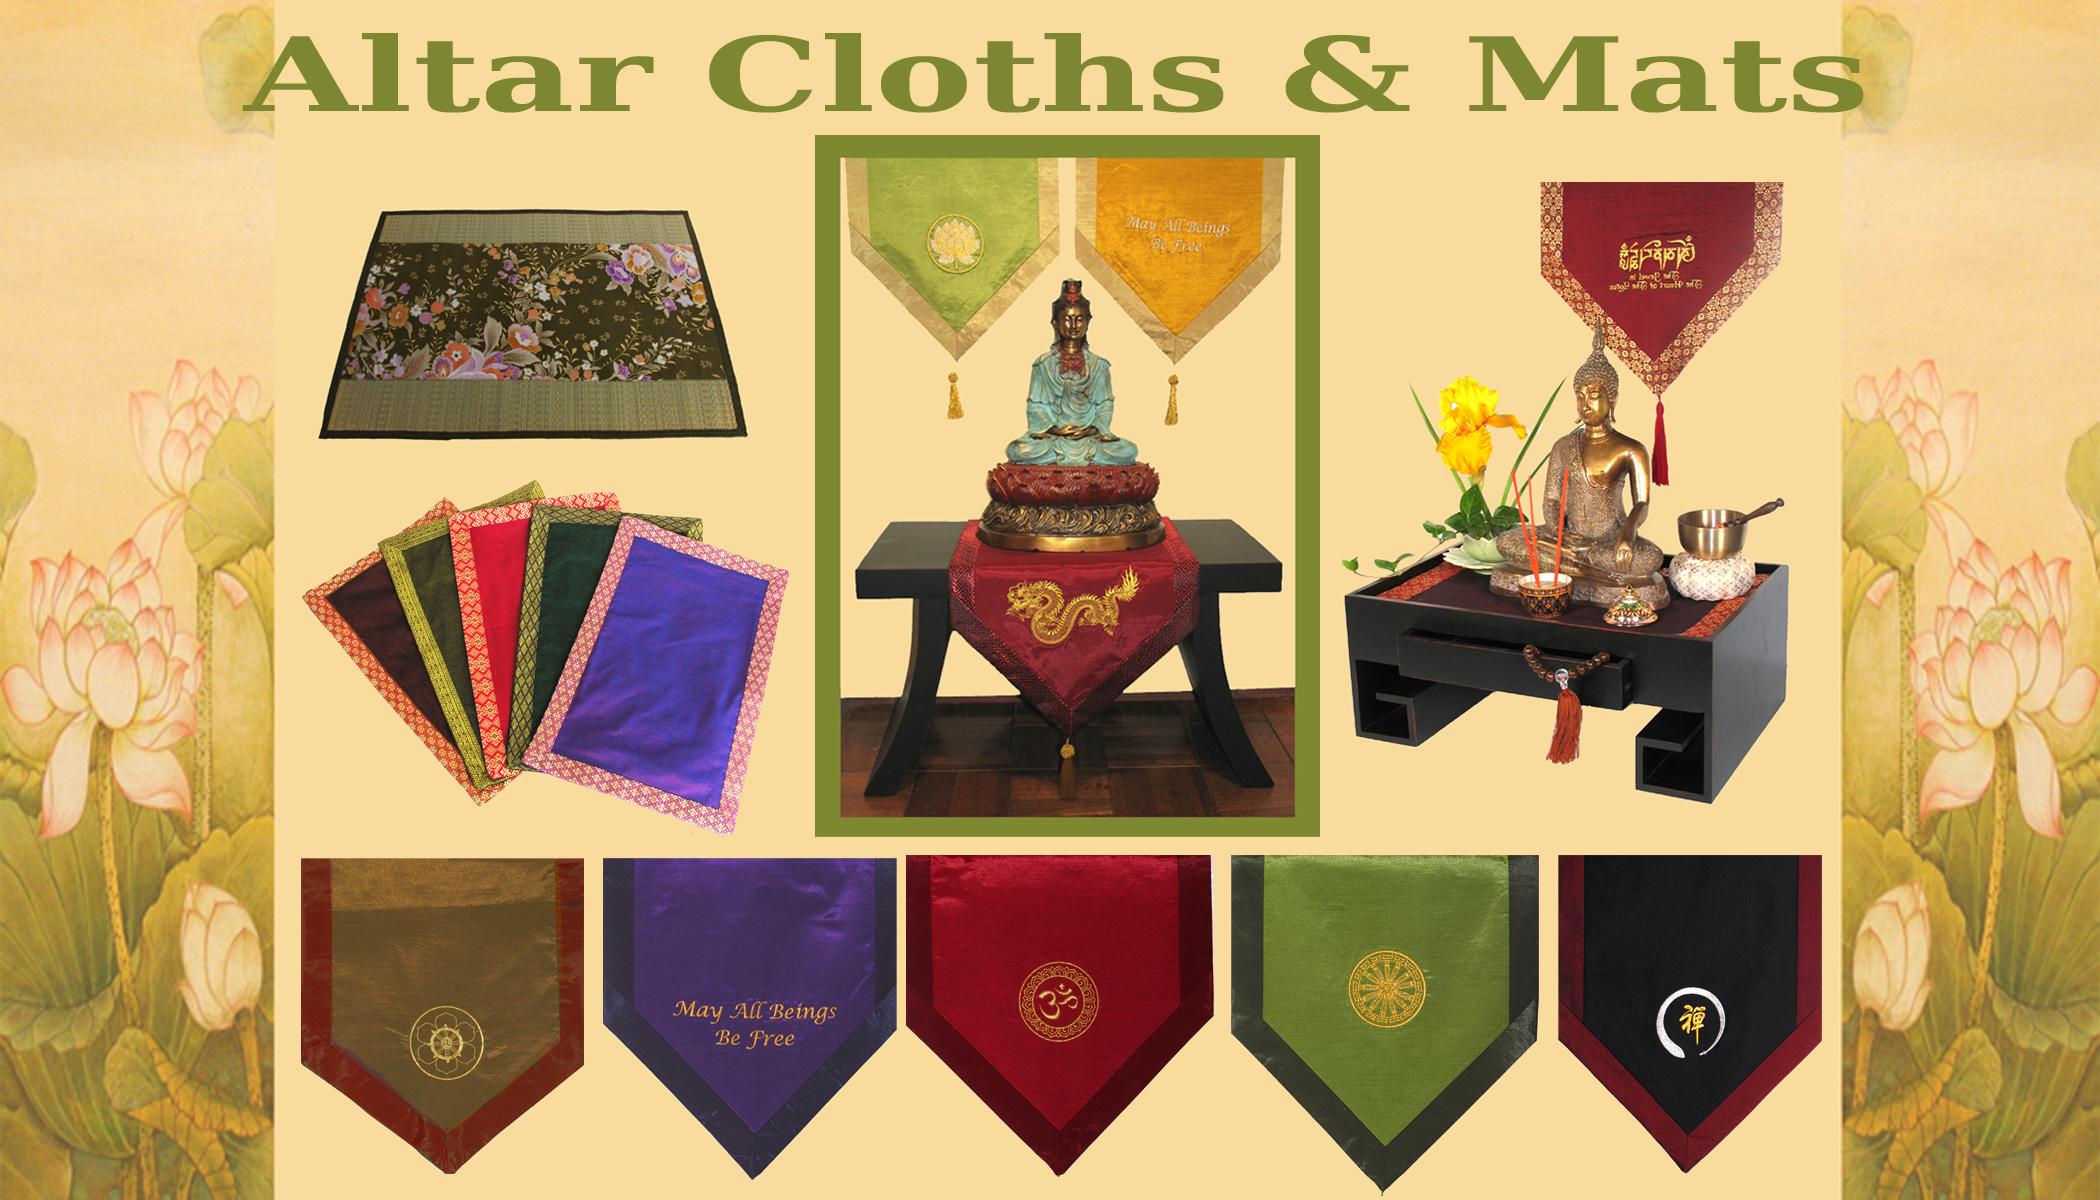 altarclothsmatswed.jpg